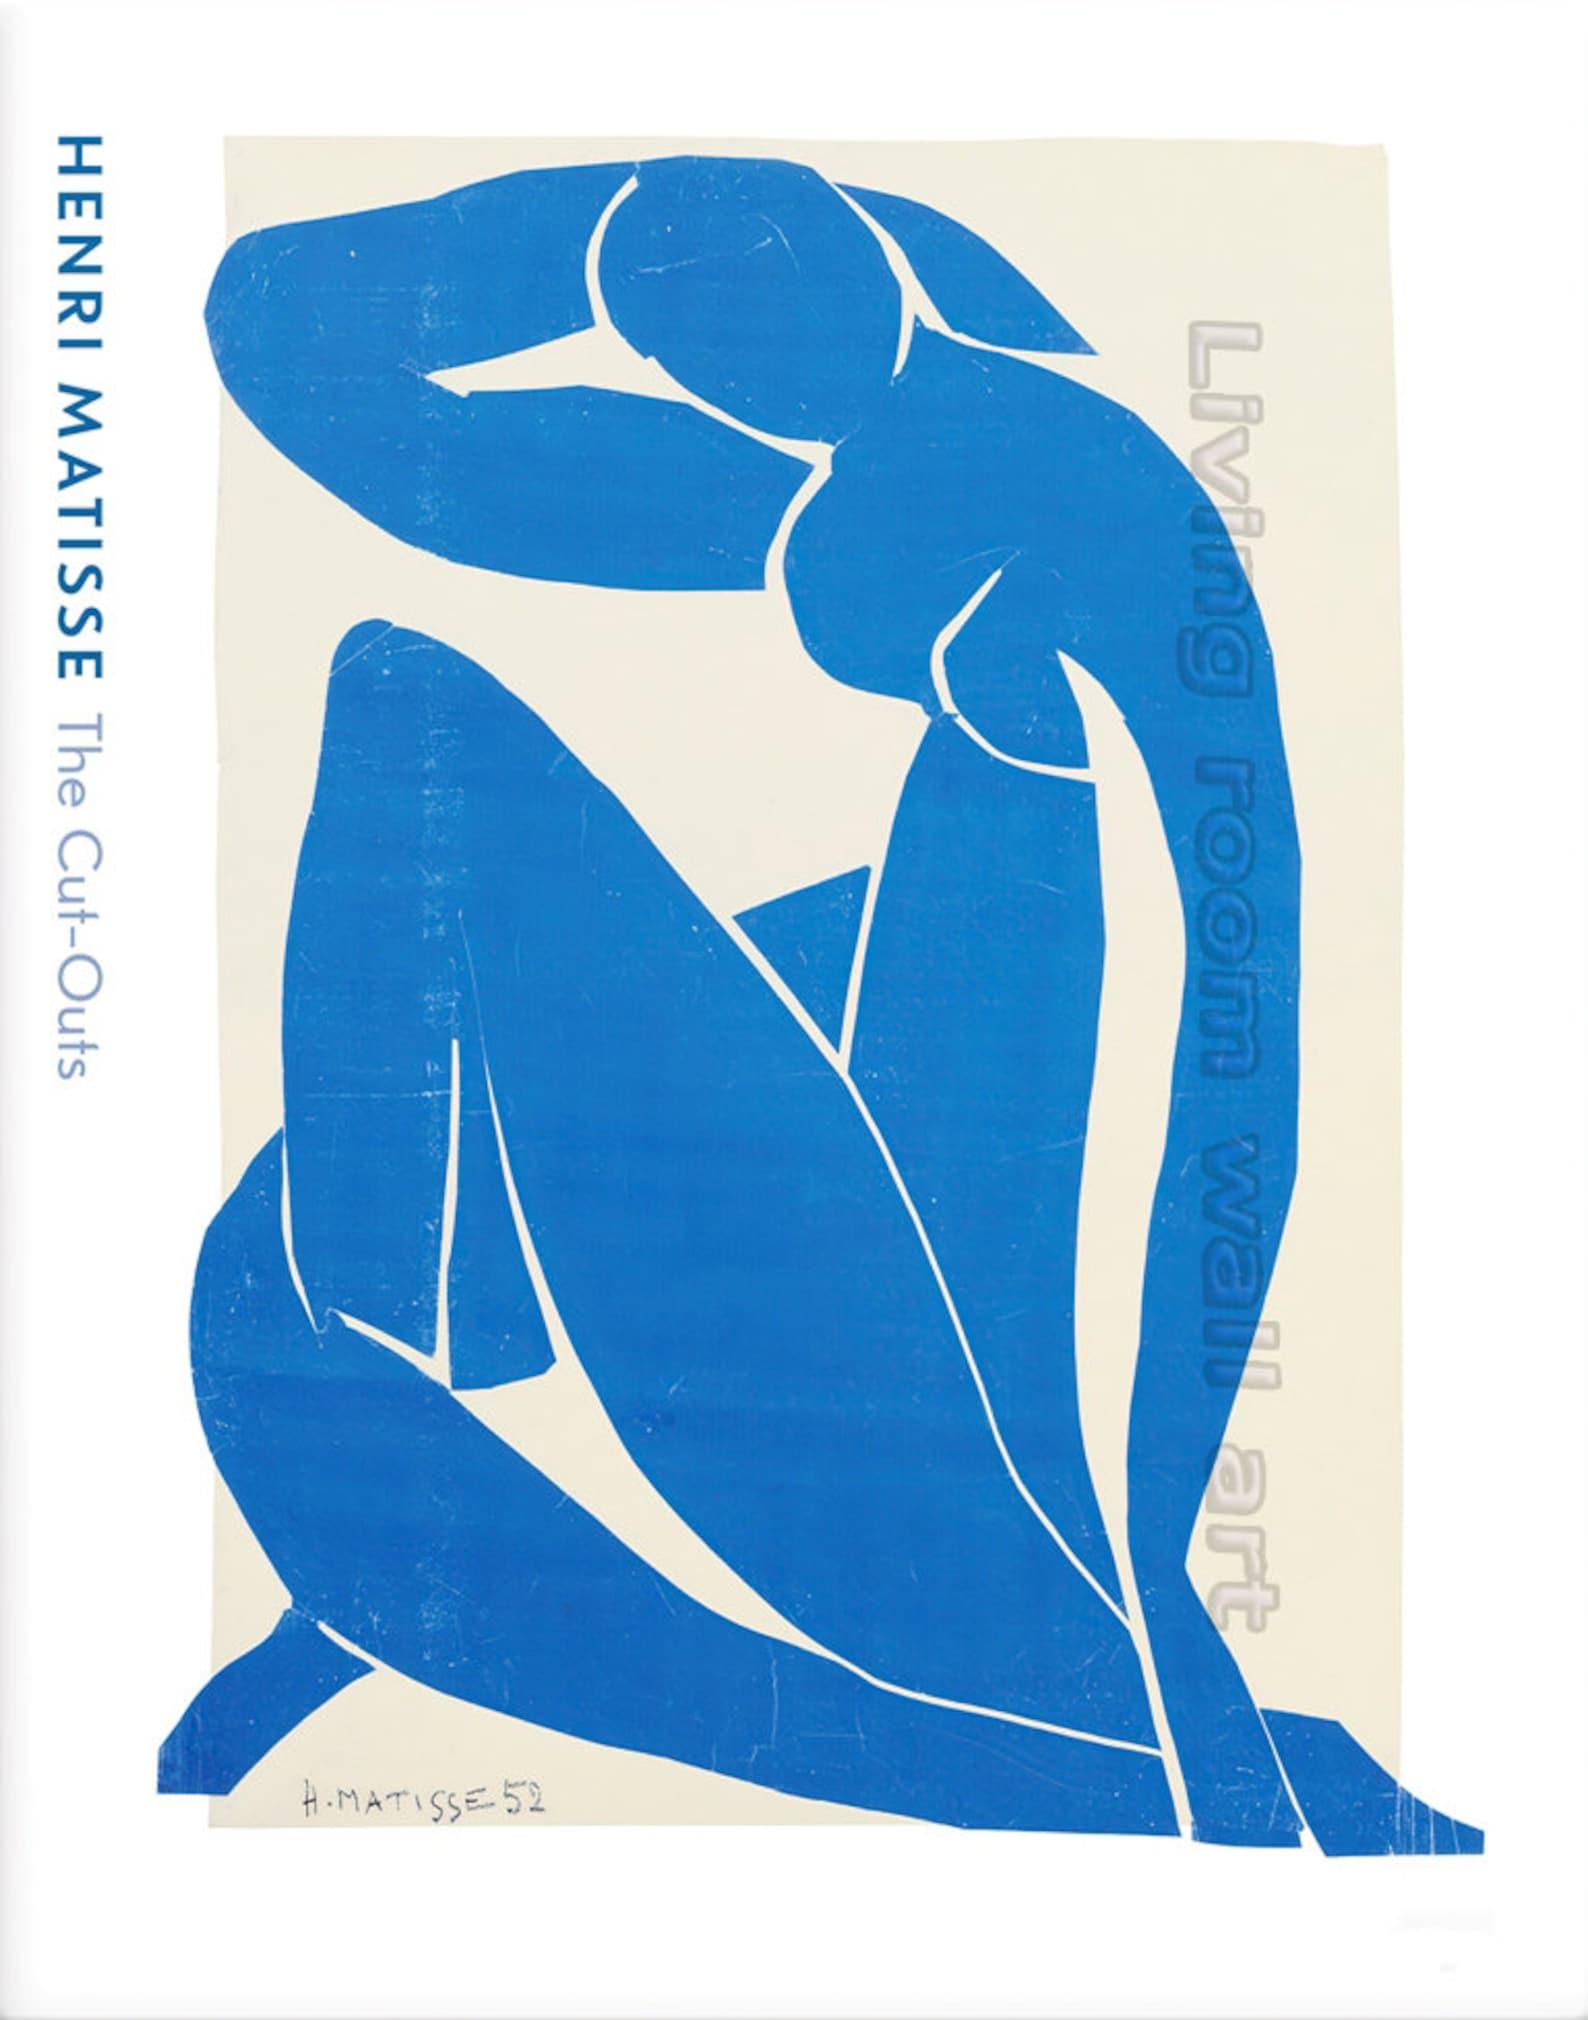 Henri Matisse Nu Bleu II (Blue Nude II) 1952 Artwork for